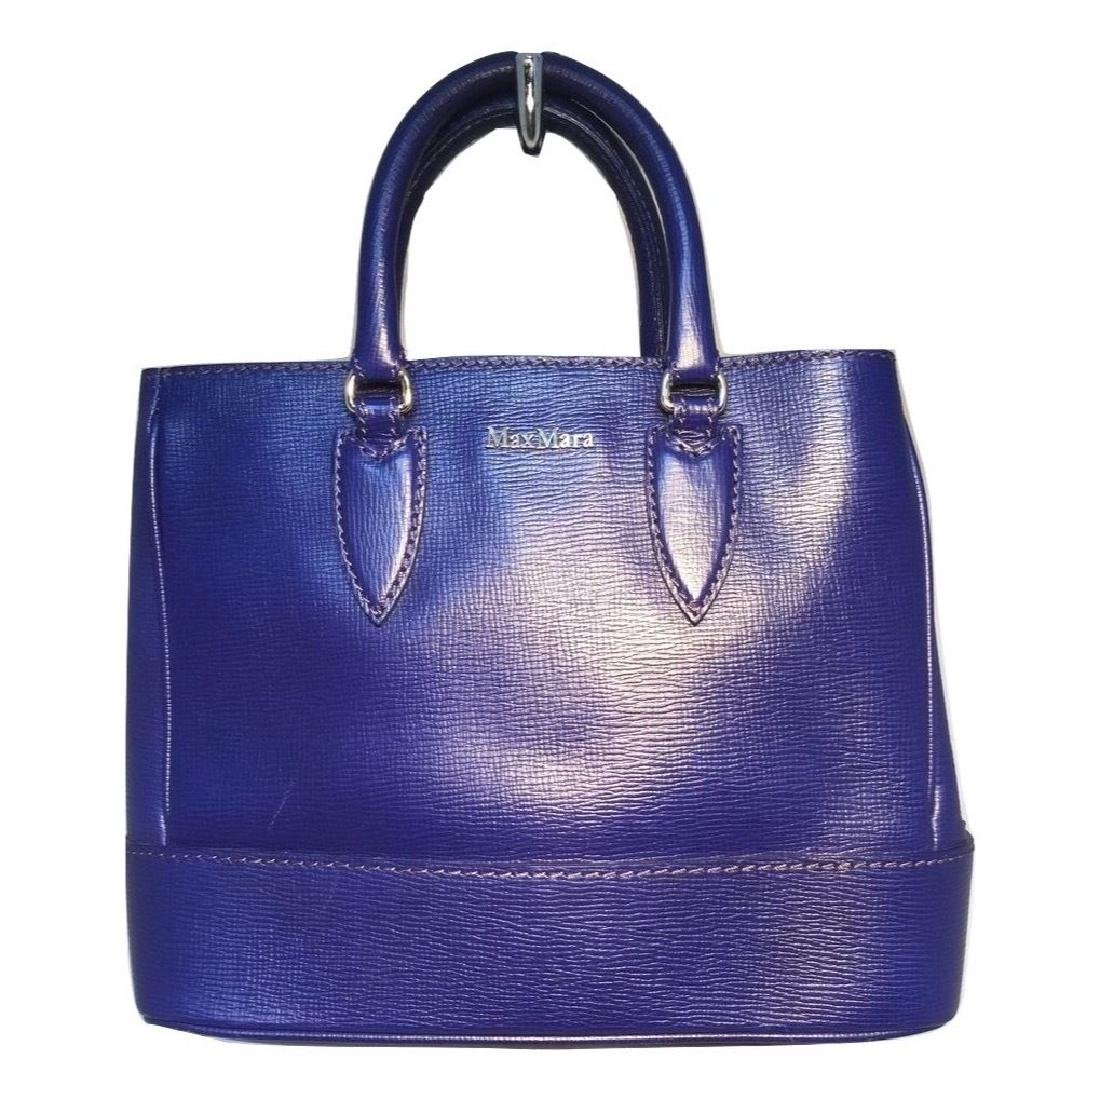 Max Mara Royal Blue Leather Handbag